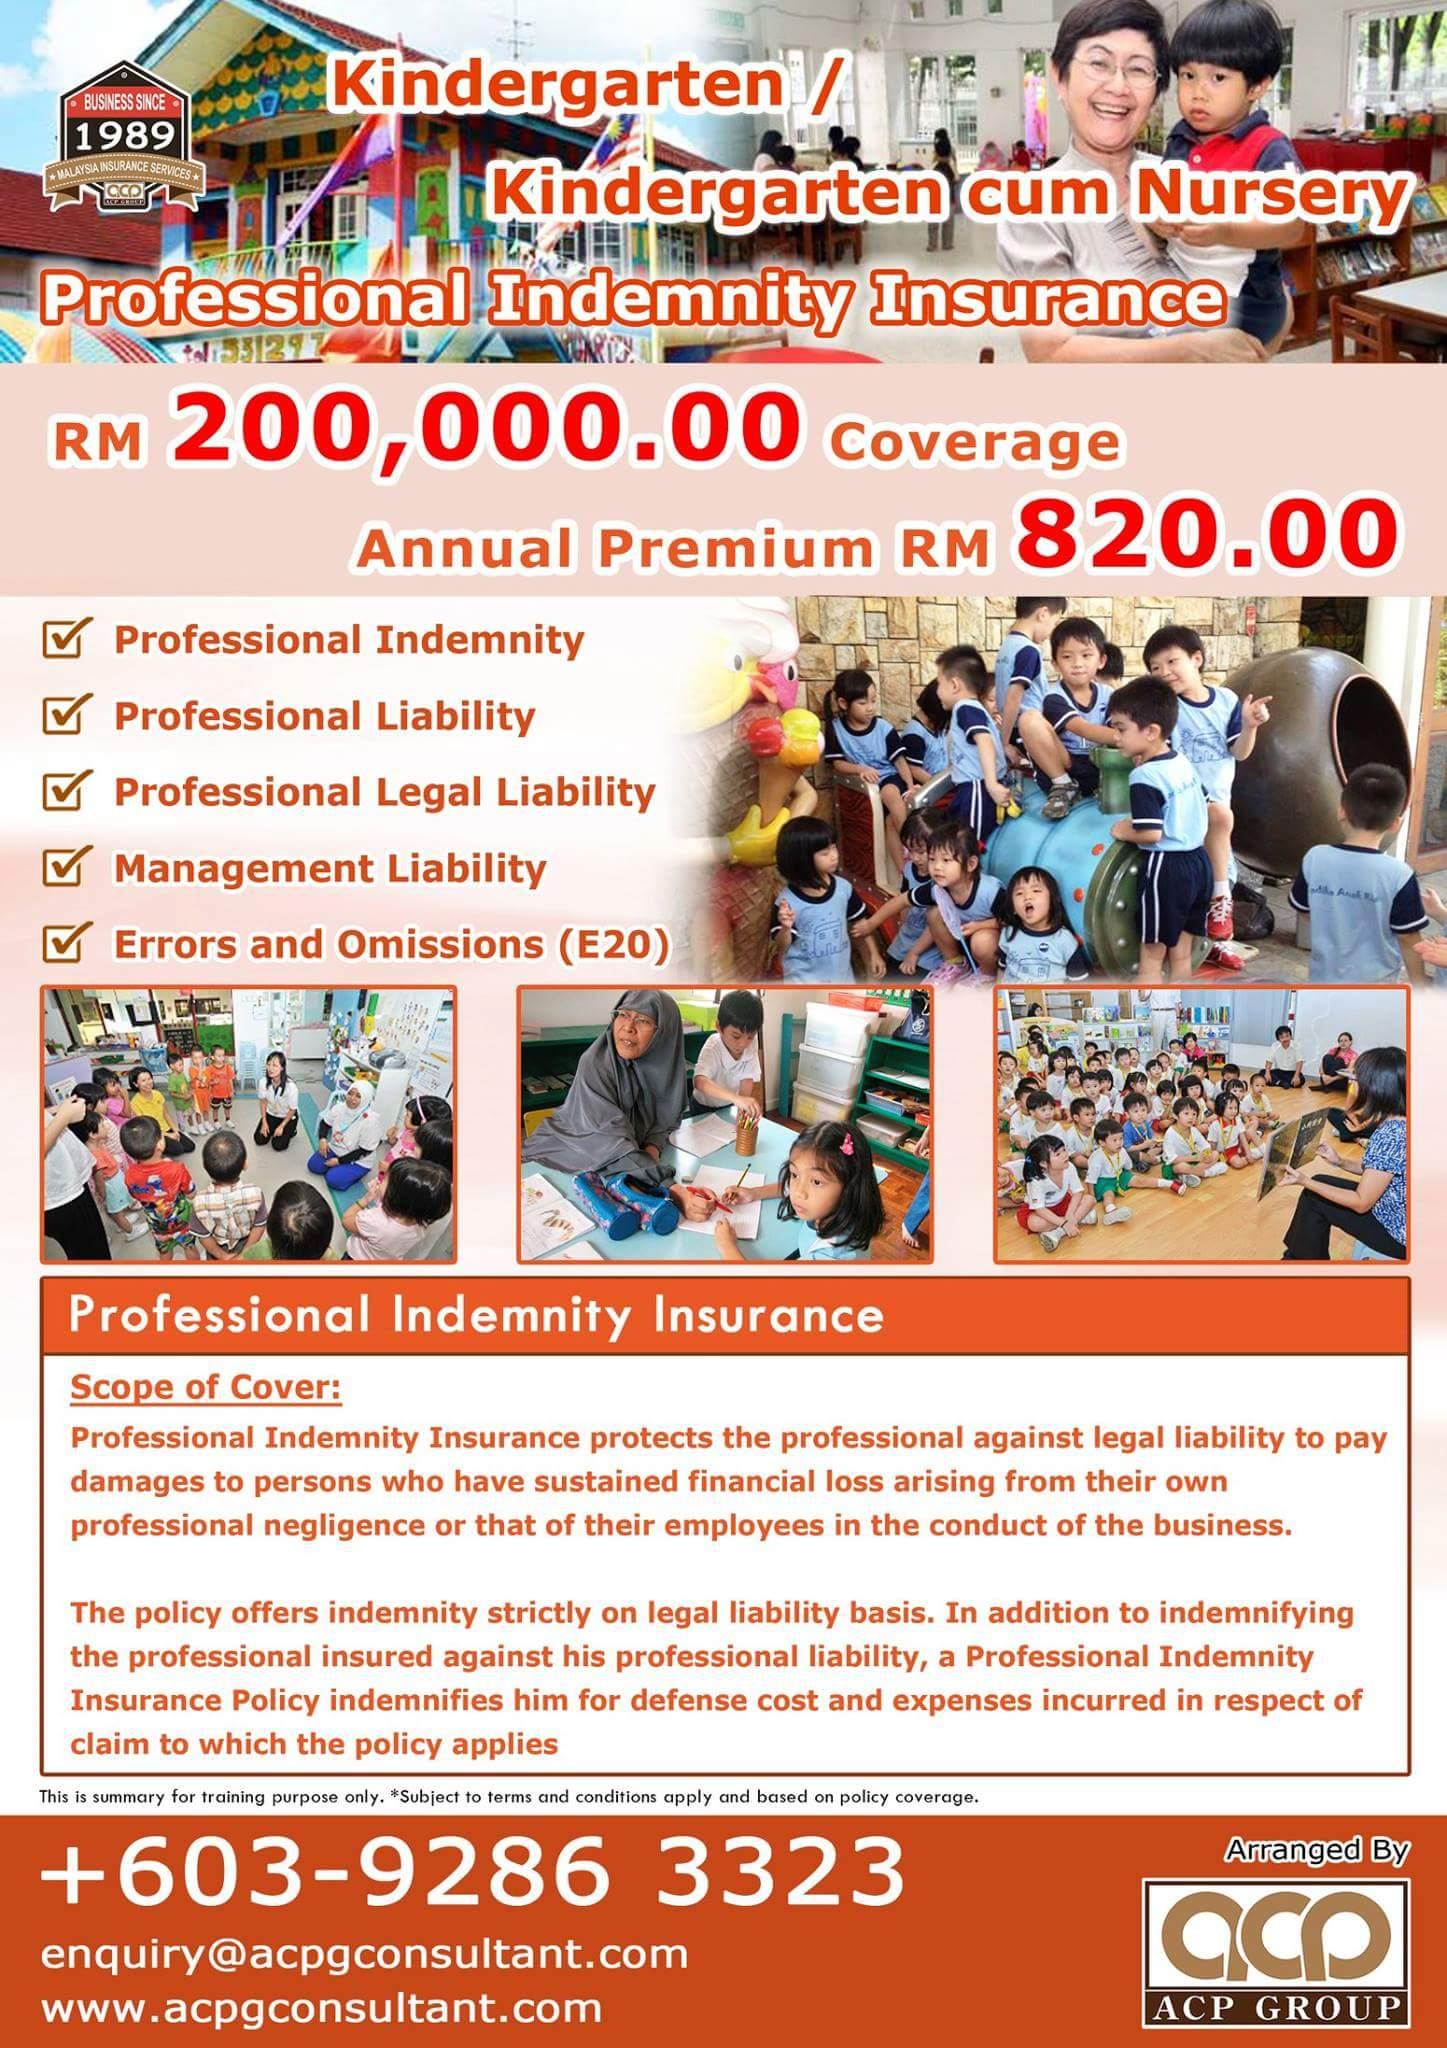 Kindergarten and Nursery Professional Indemnity Insurance ...